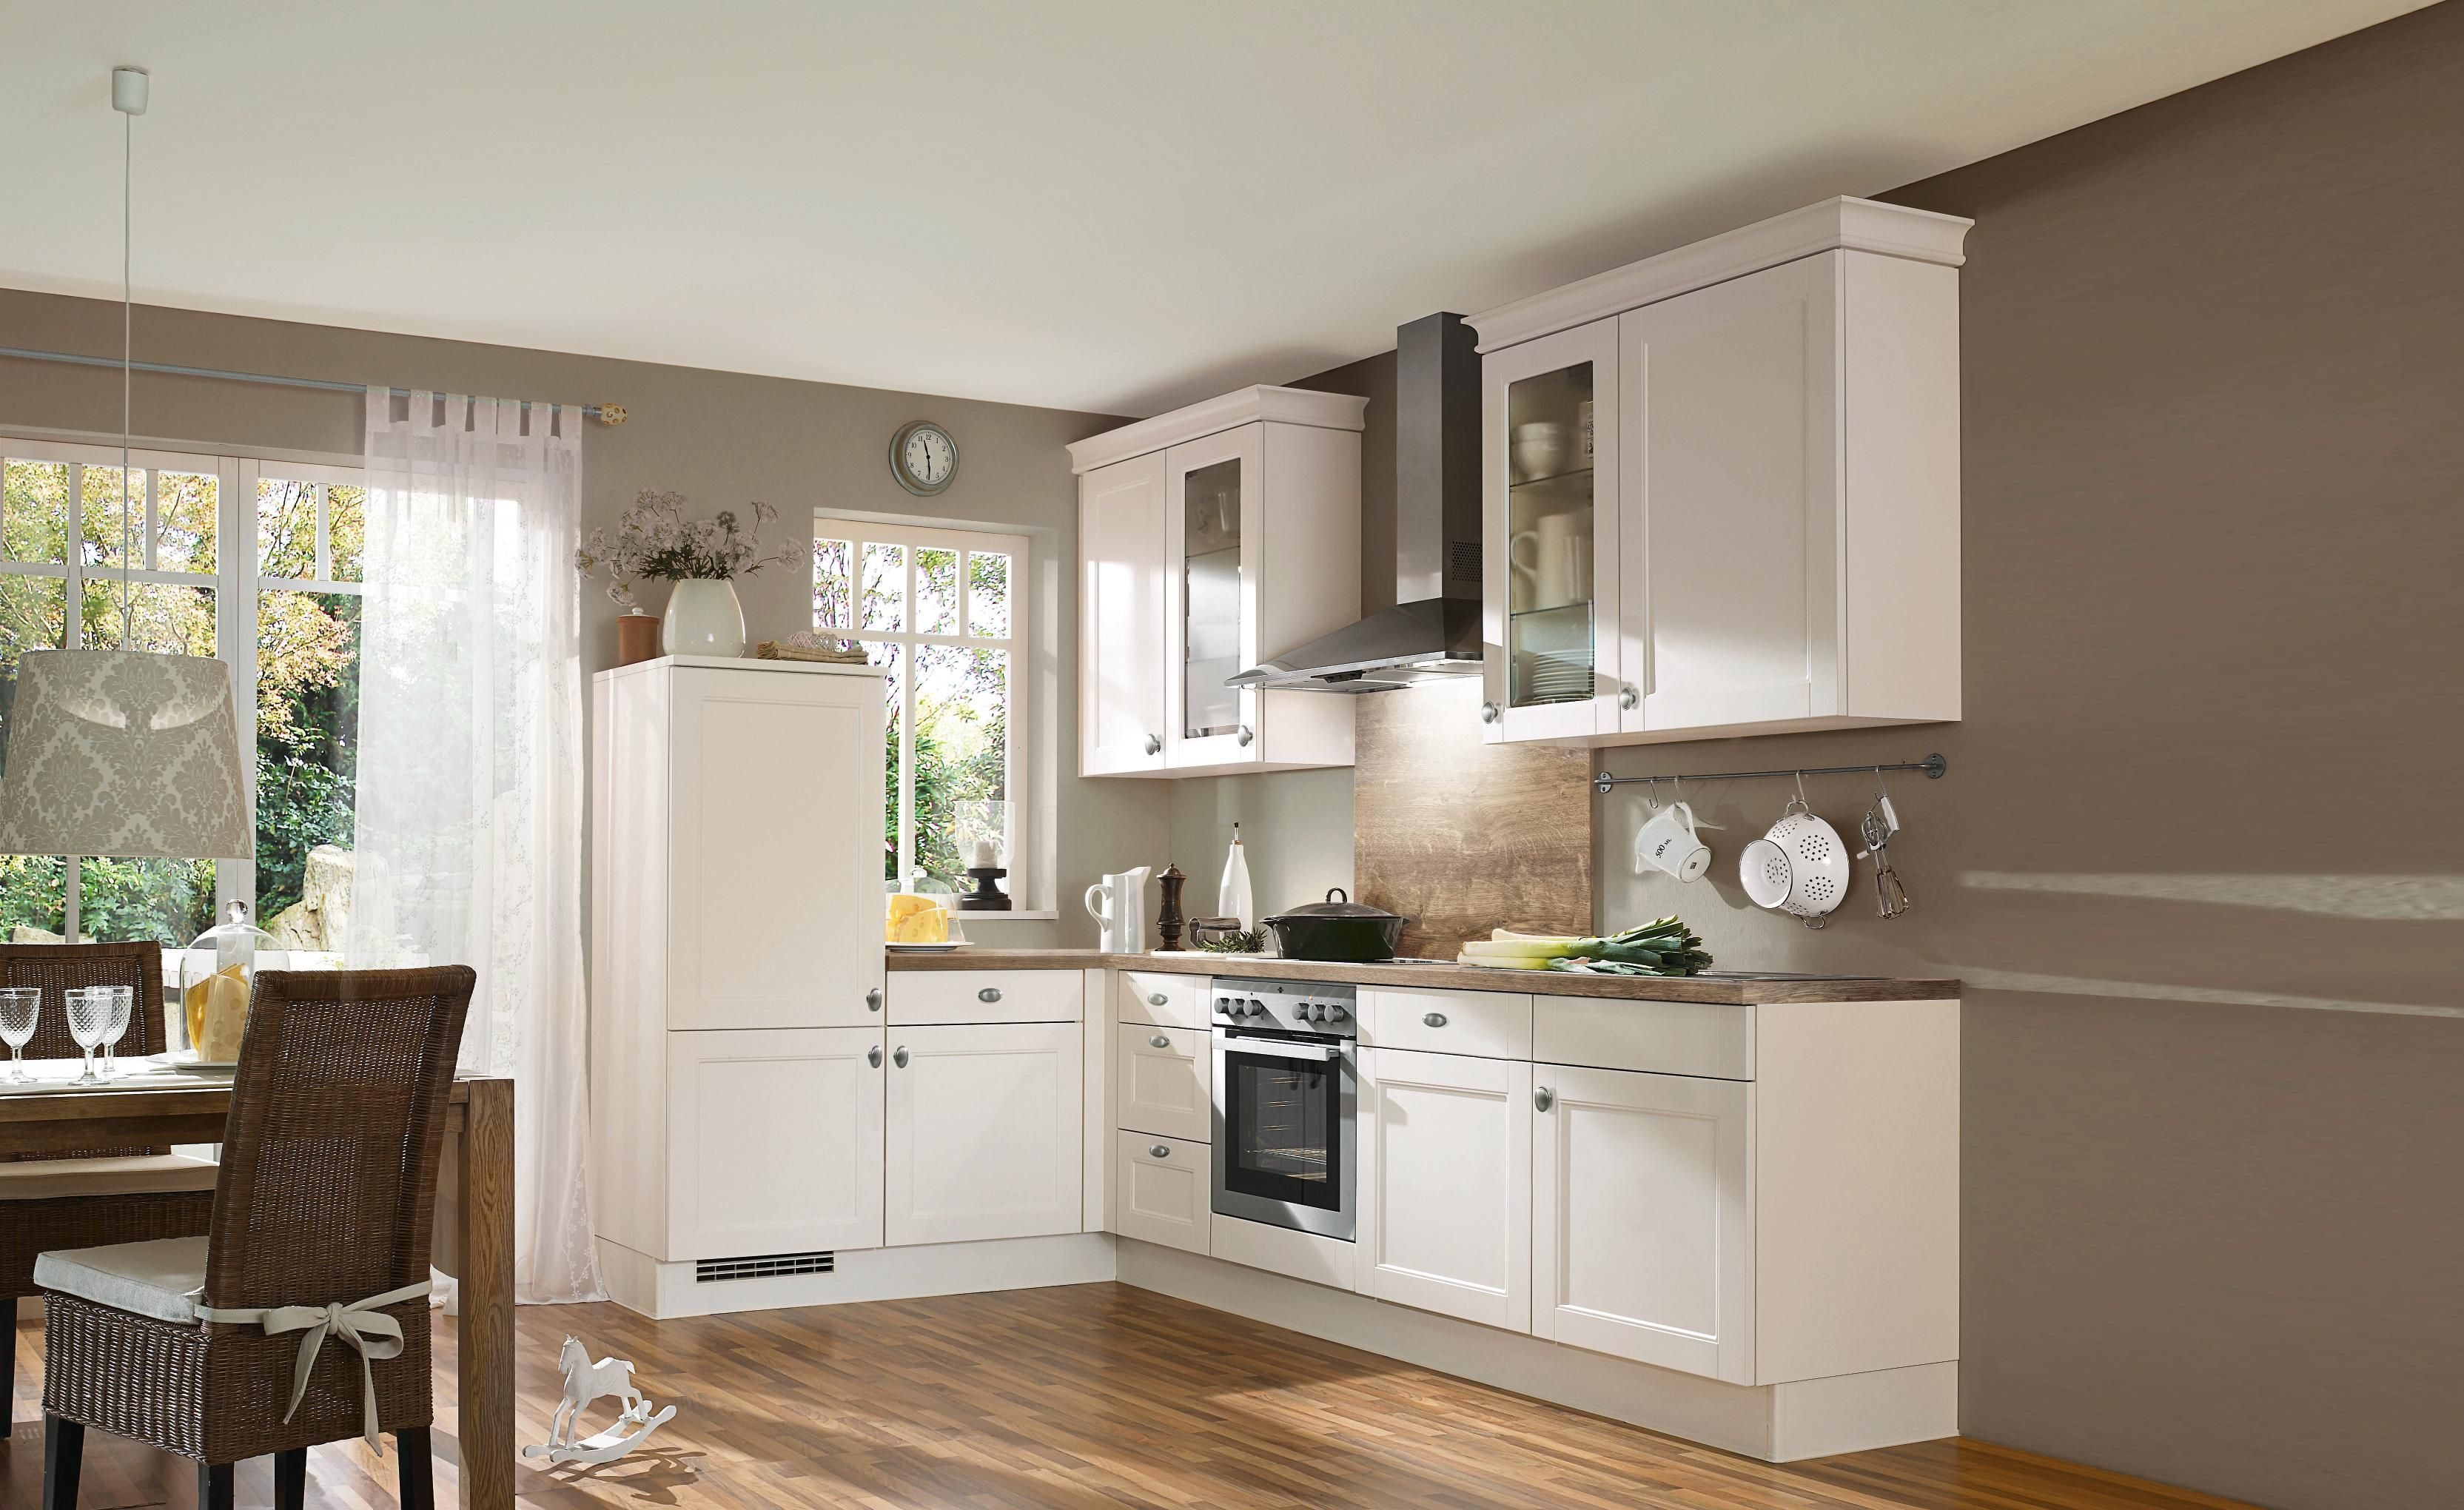 Helle Küche Wandfarbe Helle Küche Wandfarbe